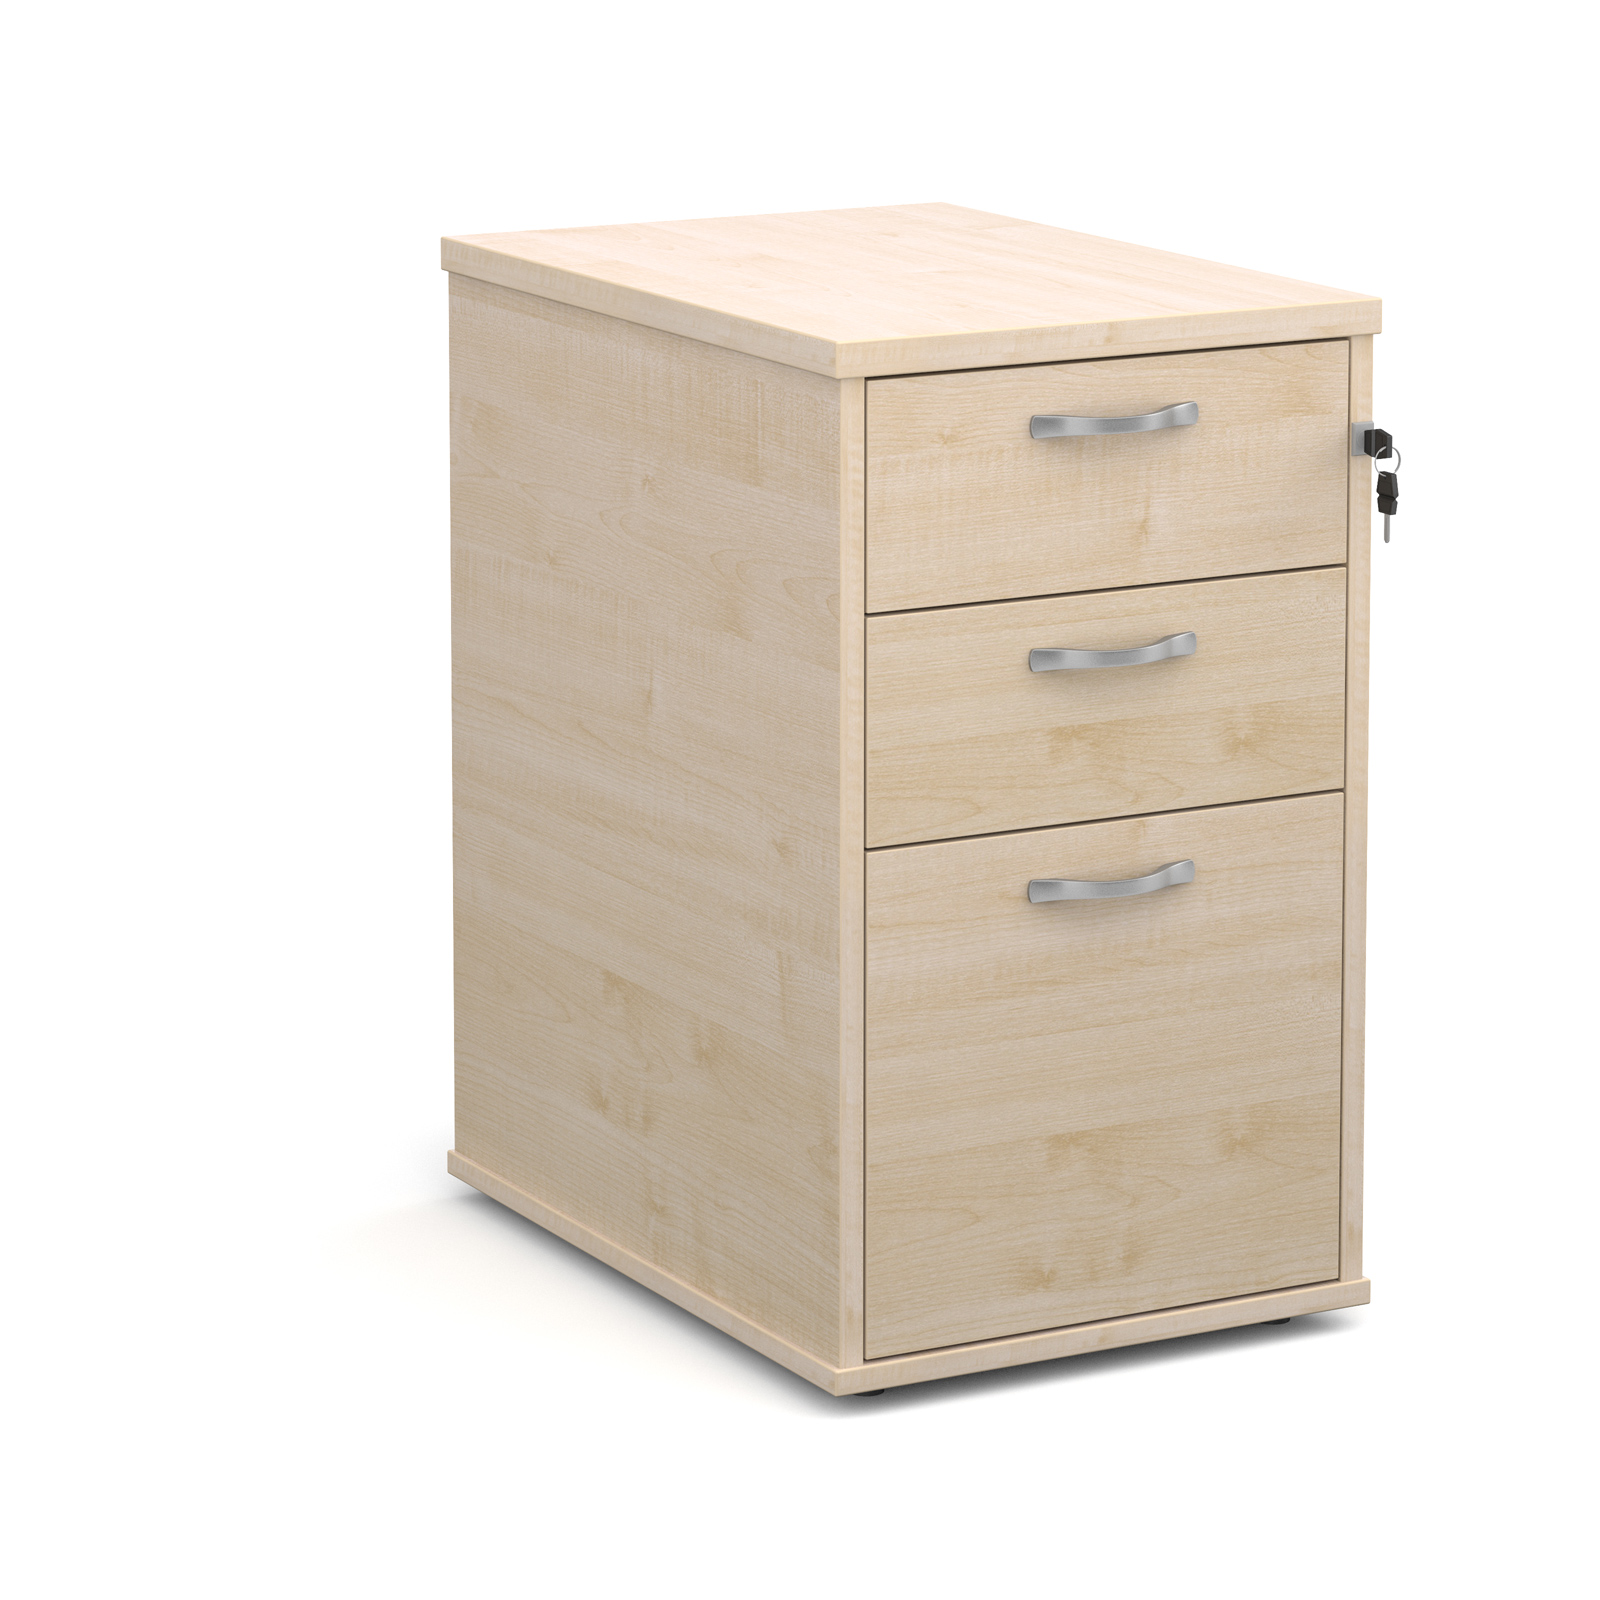 Image for Desk High Pedestal With Silver Handles